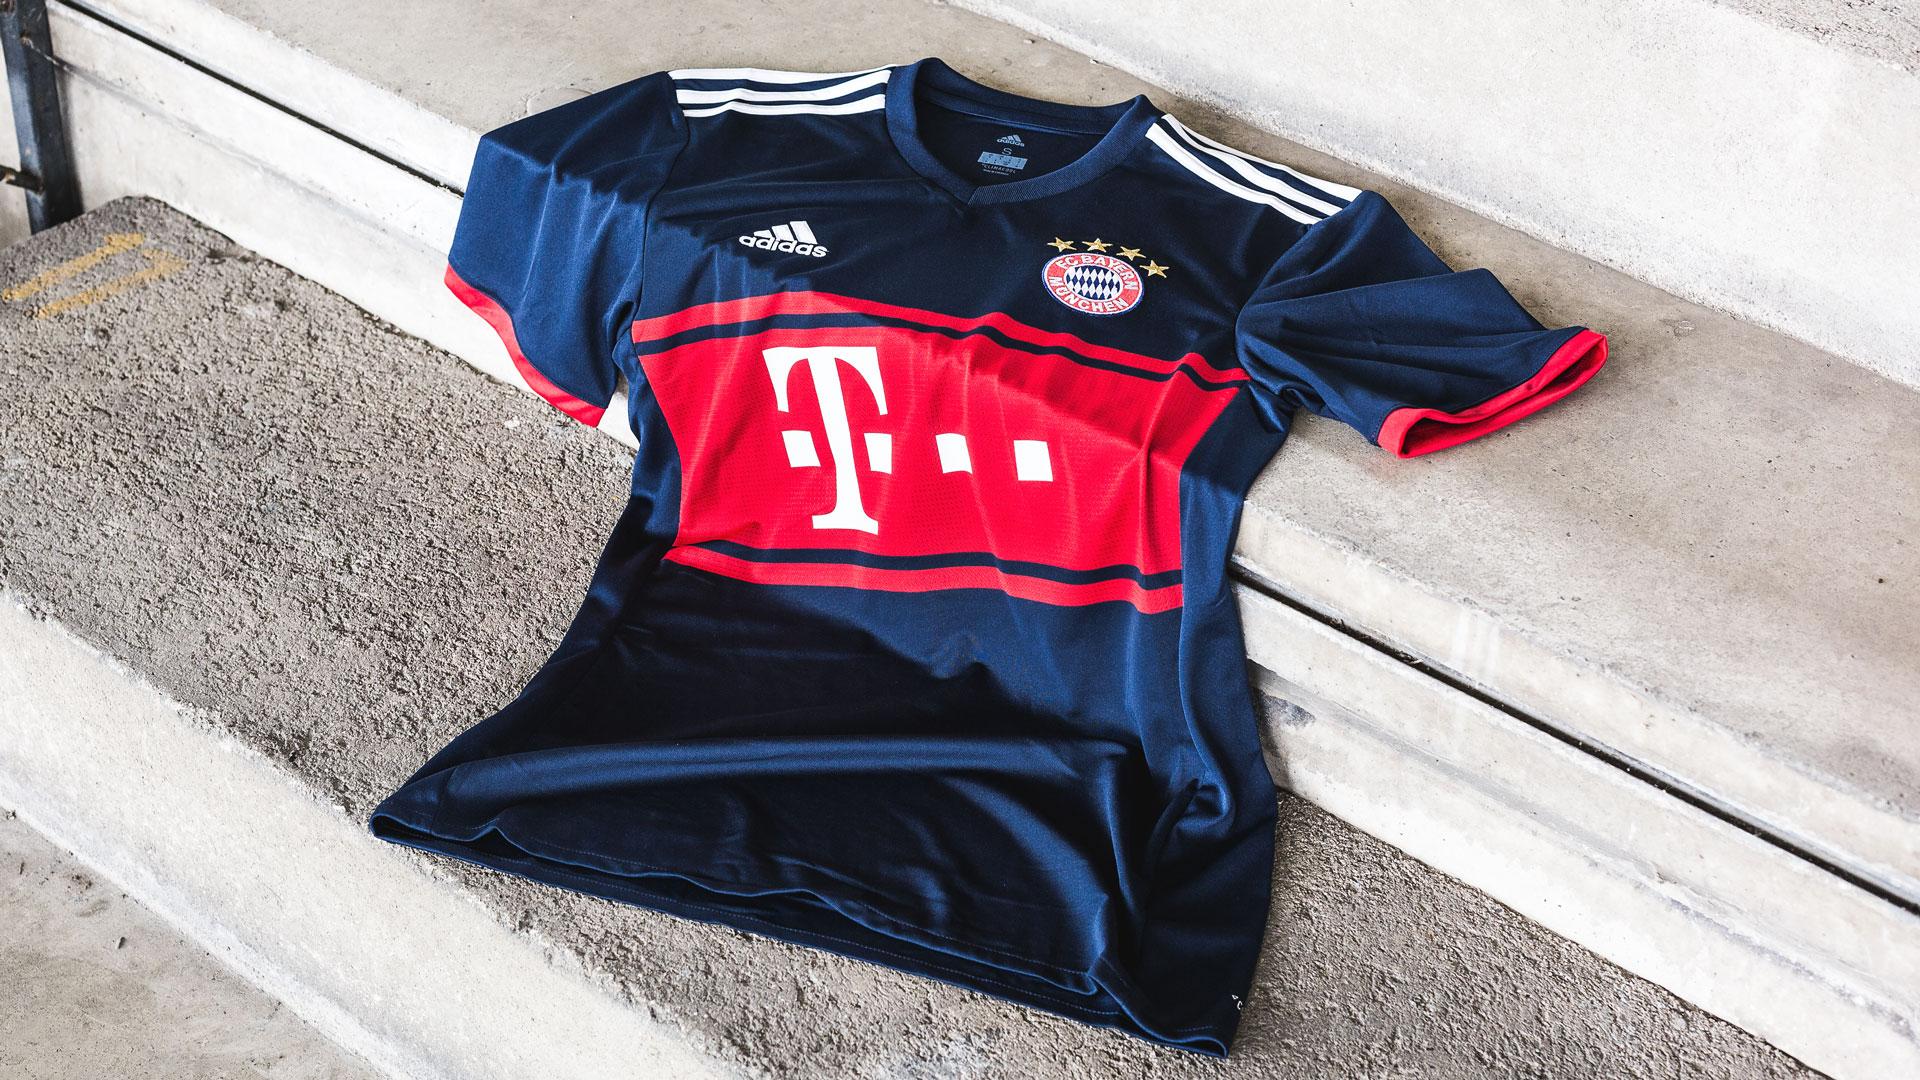 sale retailer c940f 09eb0 adidas launches new FC Bayern Munich away shirt